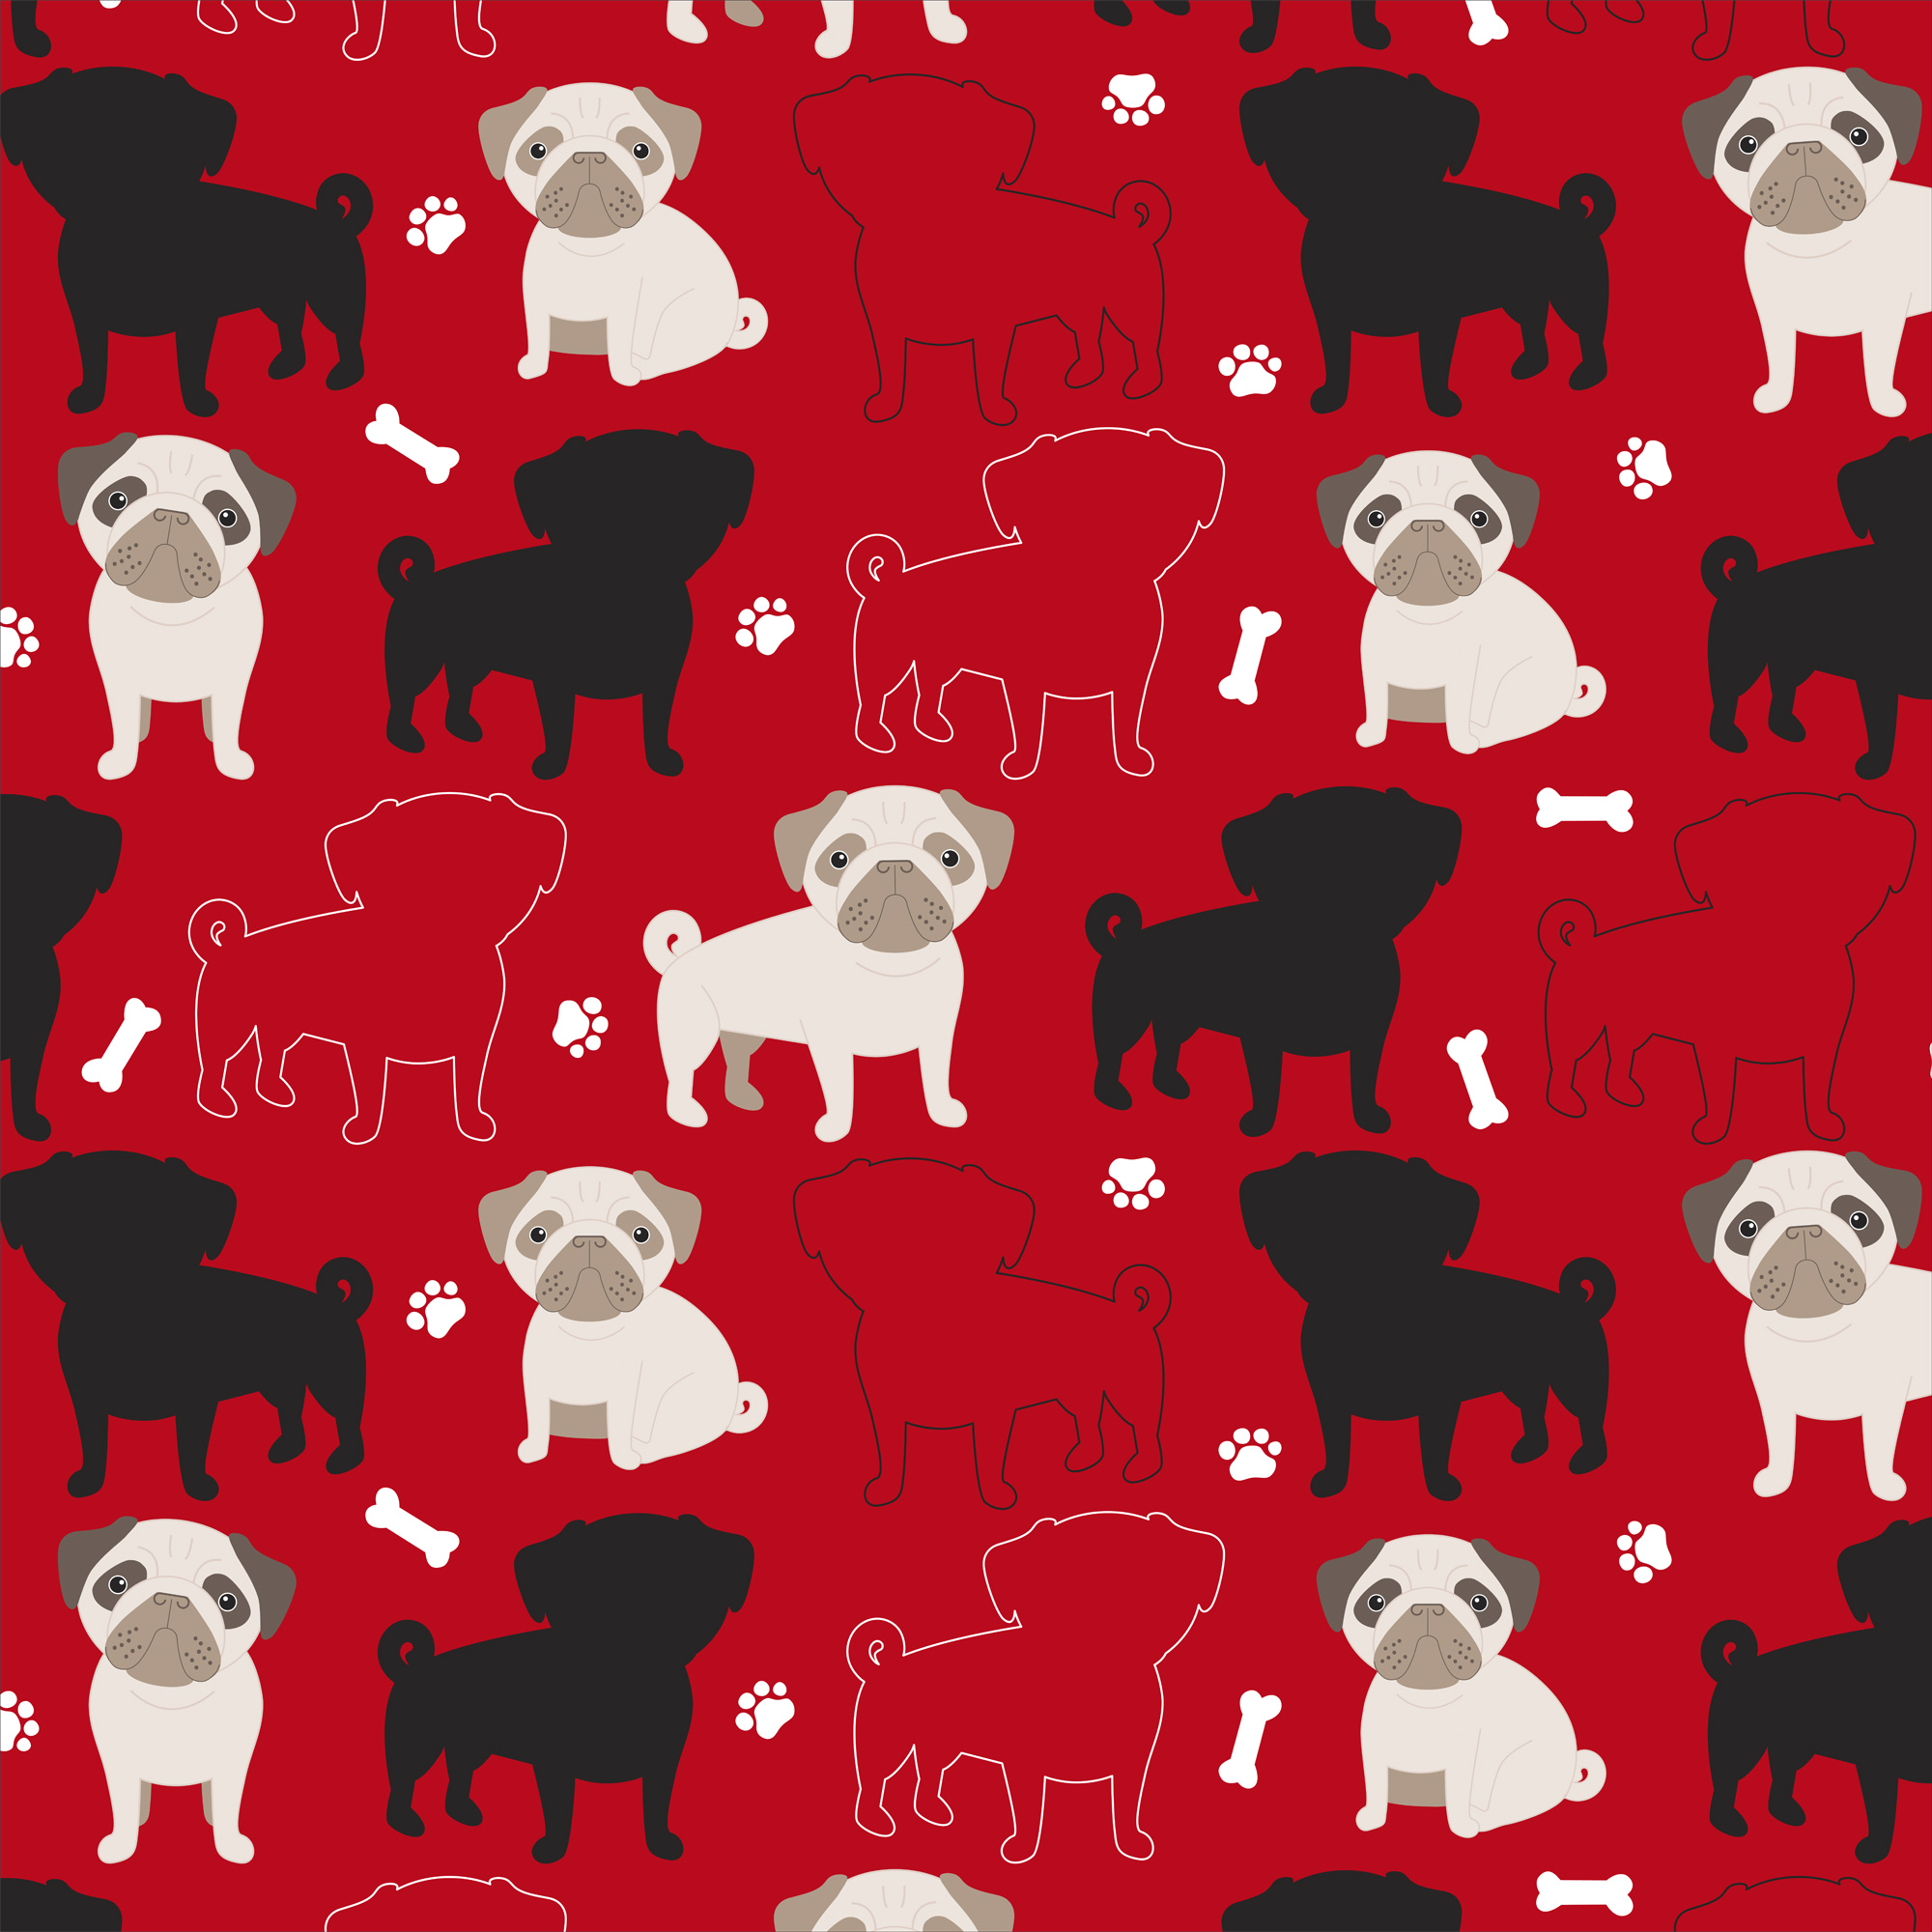 "David Textiles Fleece 36"" x 60"" Oh My Pugness Red Anti-Pill Fabric, 1 Each"